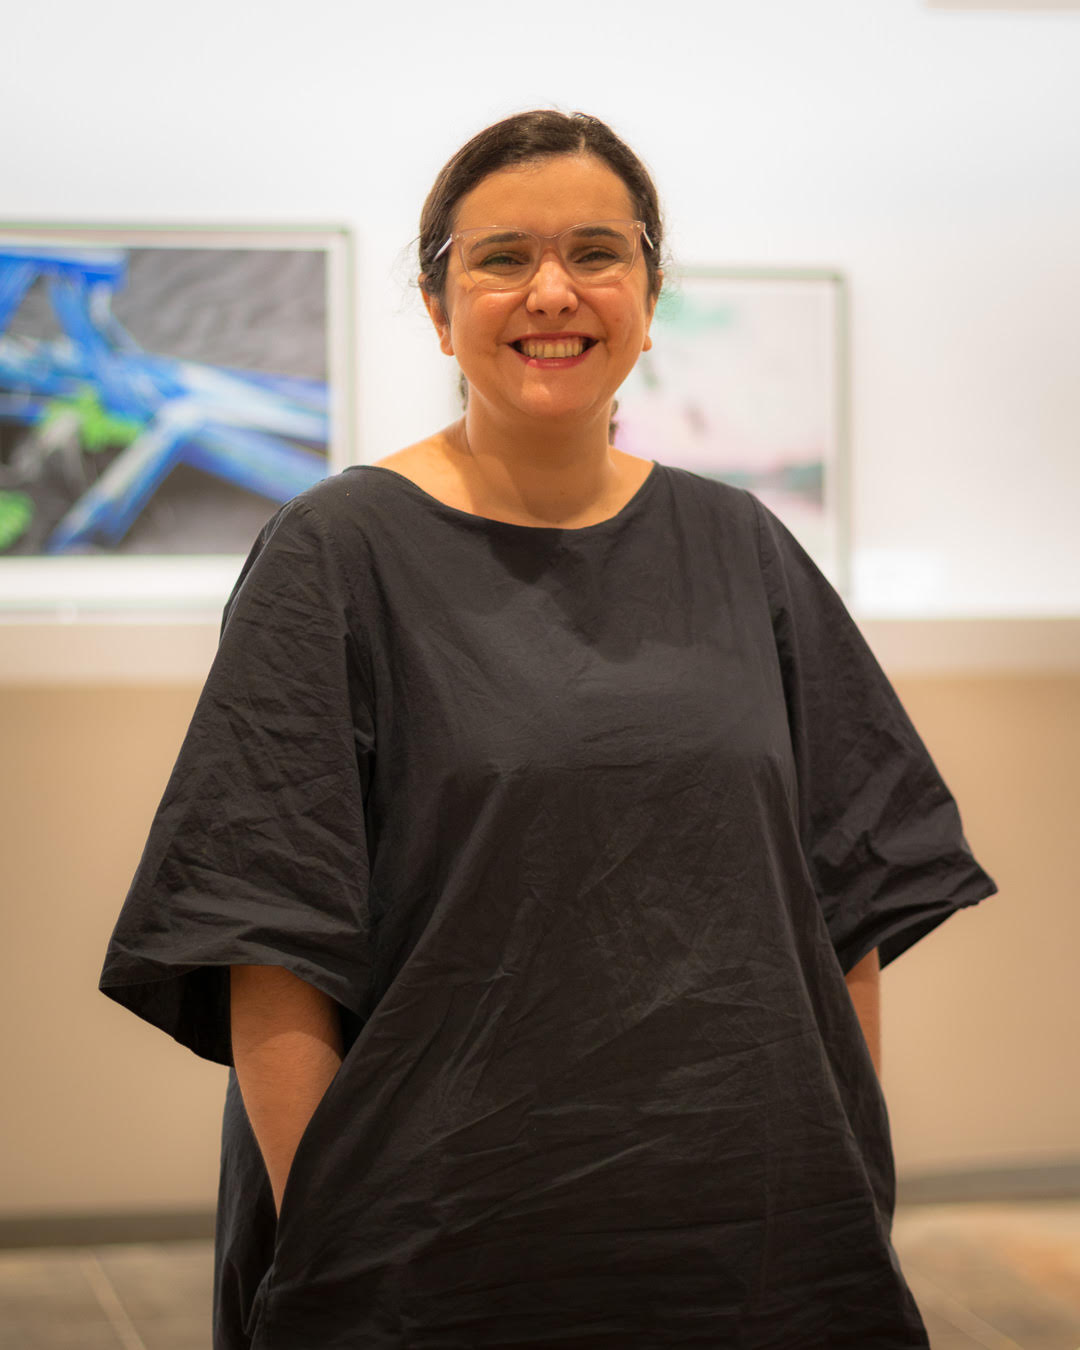 Lara Mendonca Guterres Torres